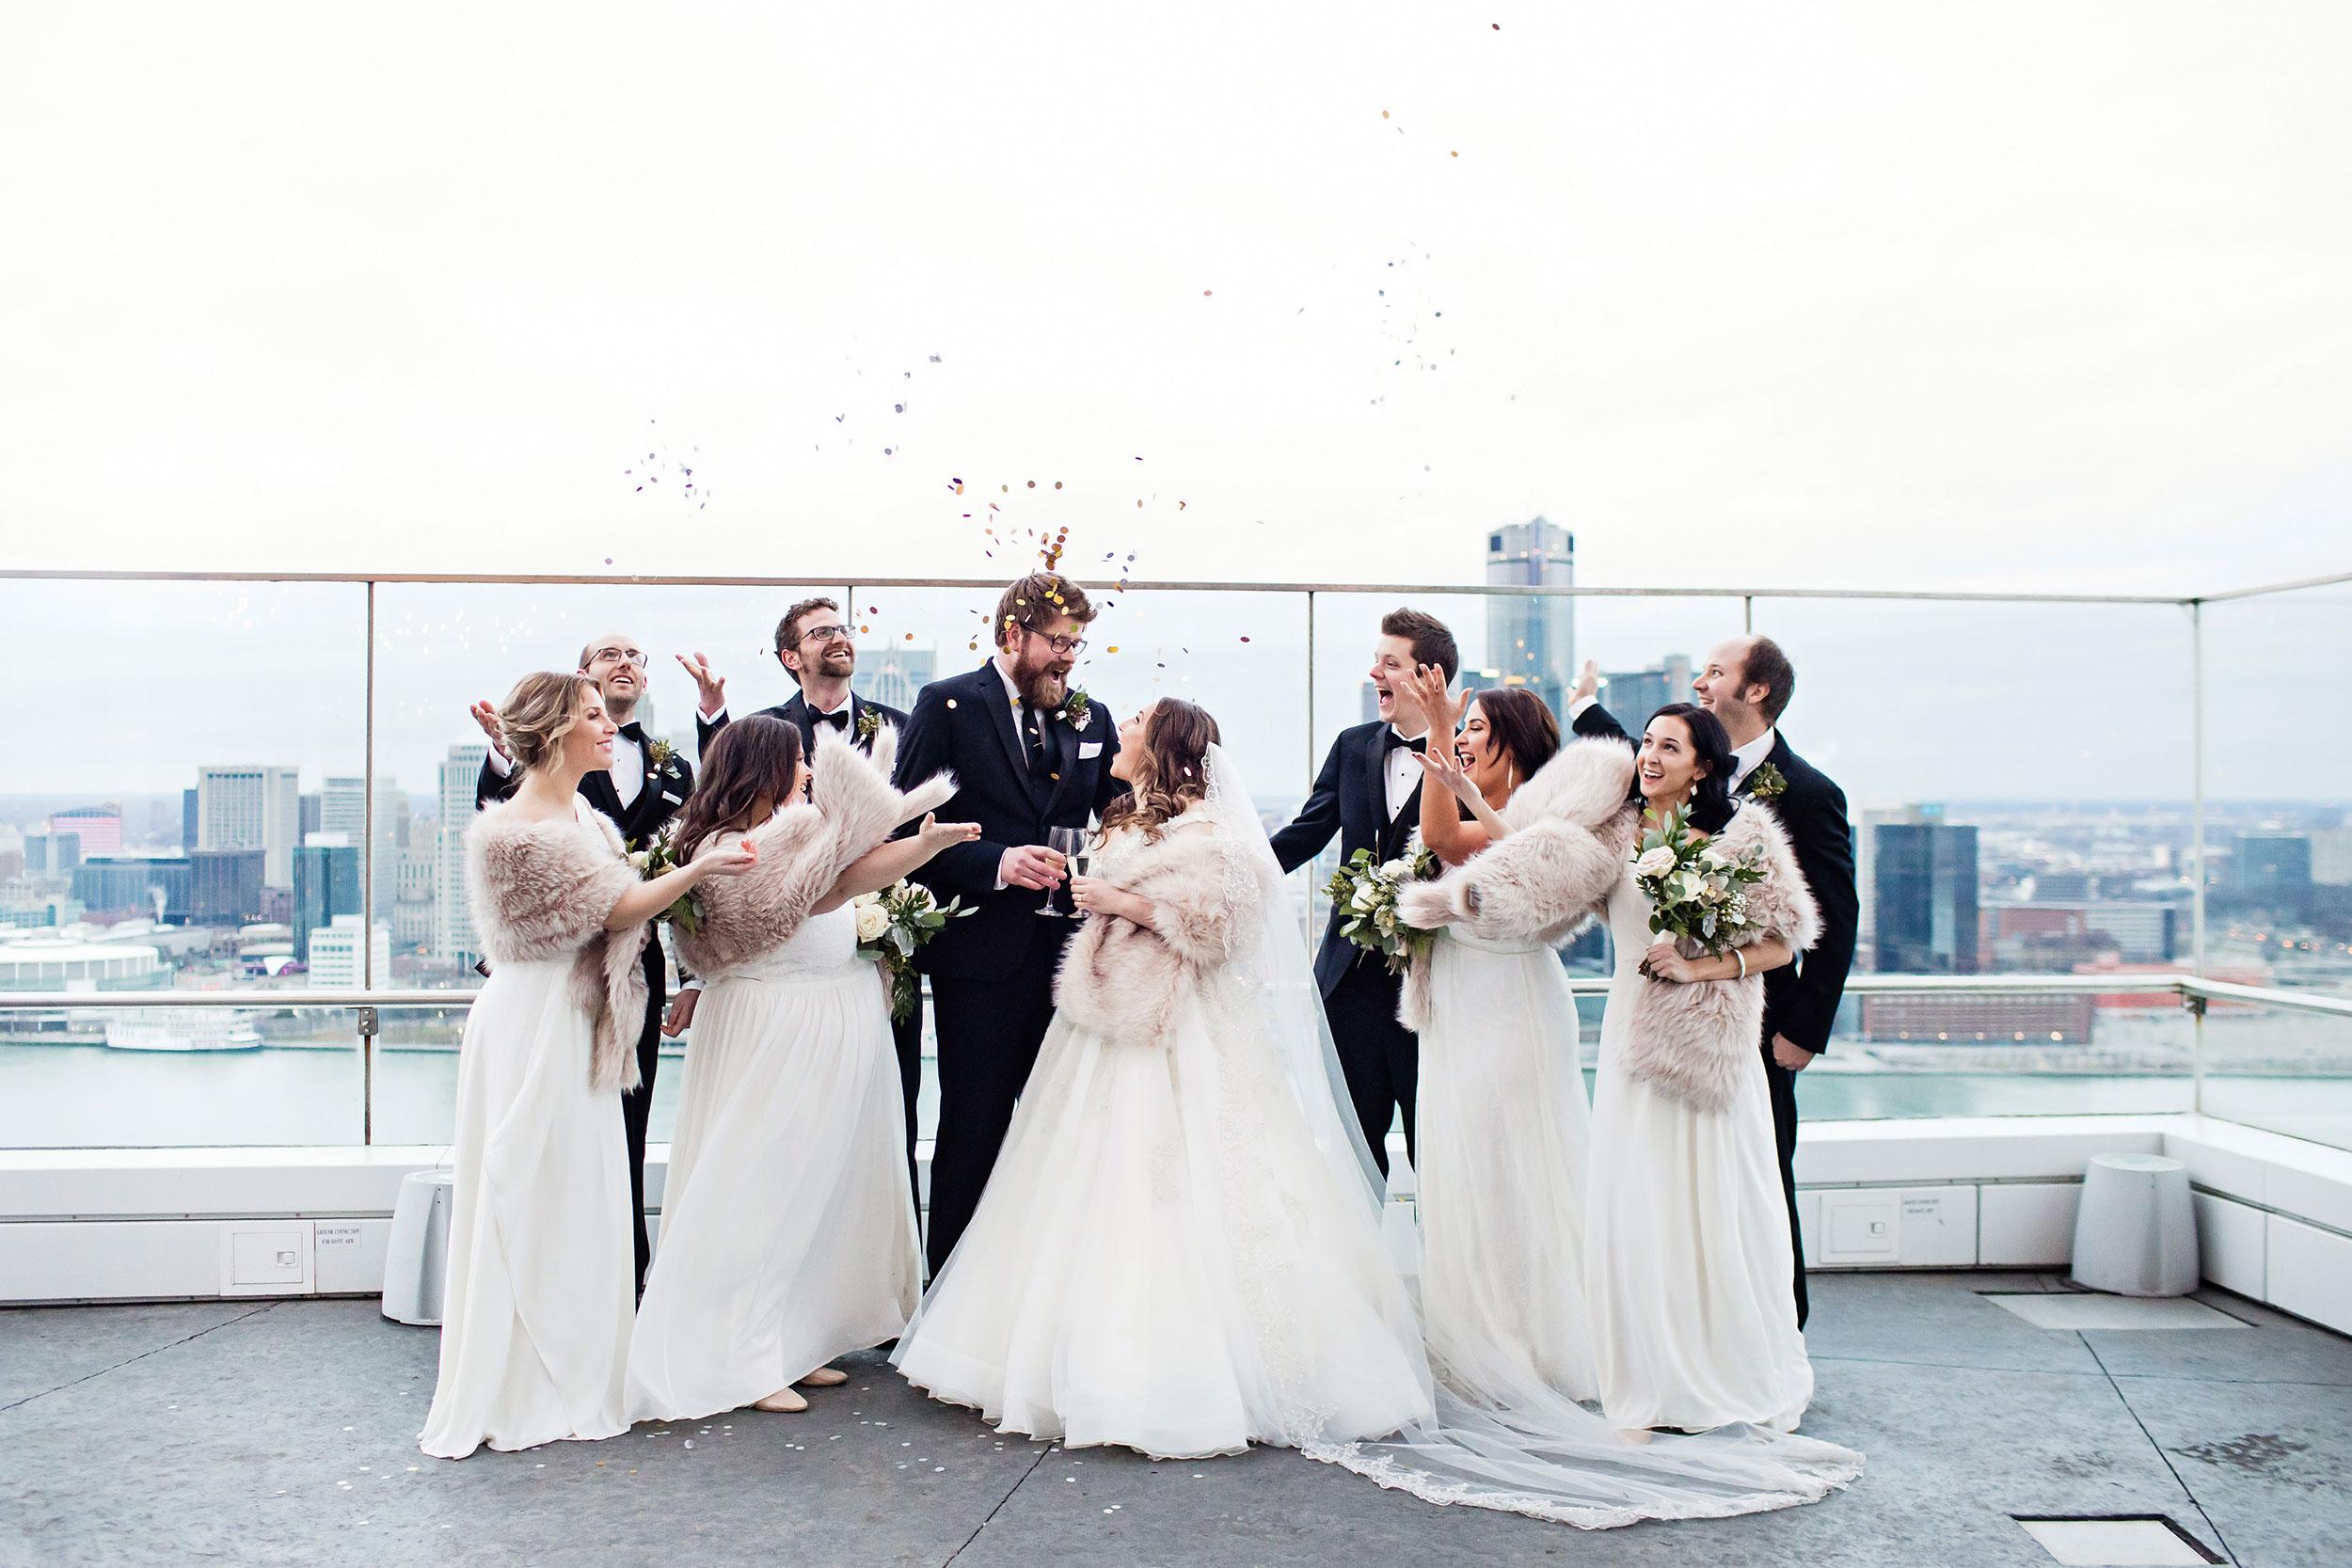 stylish-wedding-photography-windsor-toronto-ontario-wedding-photographer-augustus-27-caesars-eryn-shea-photography-33.JPG